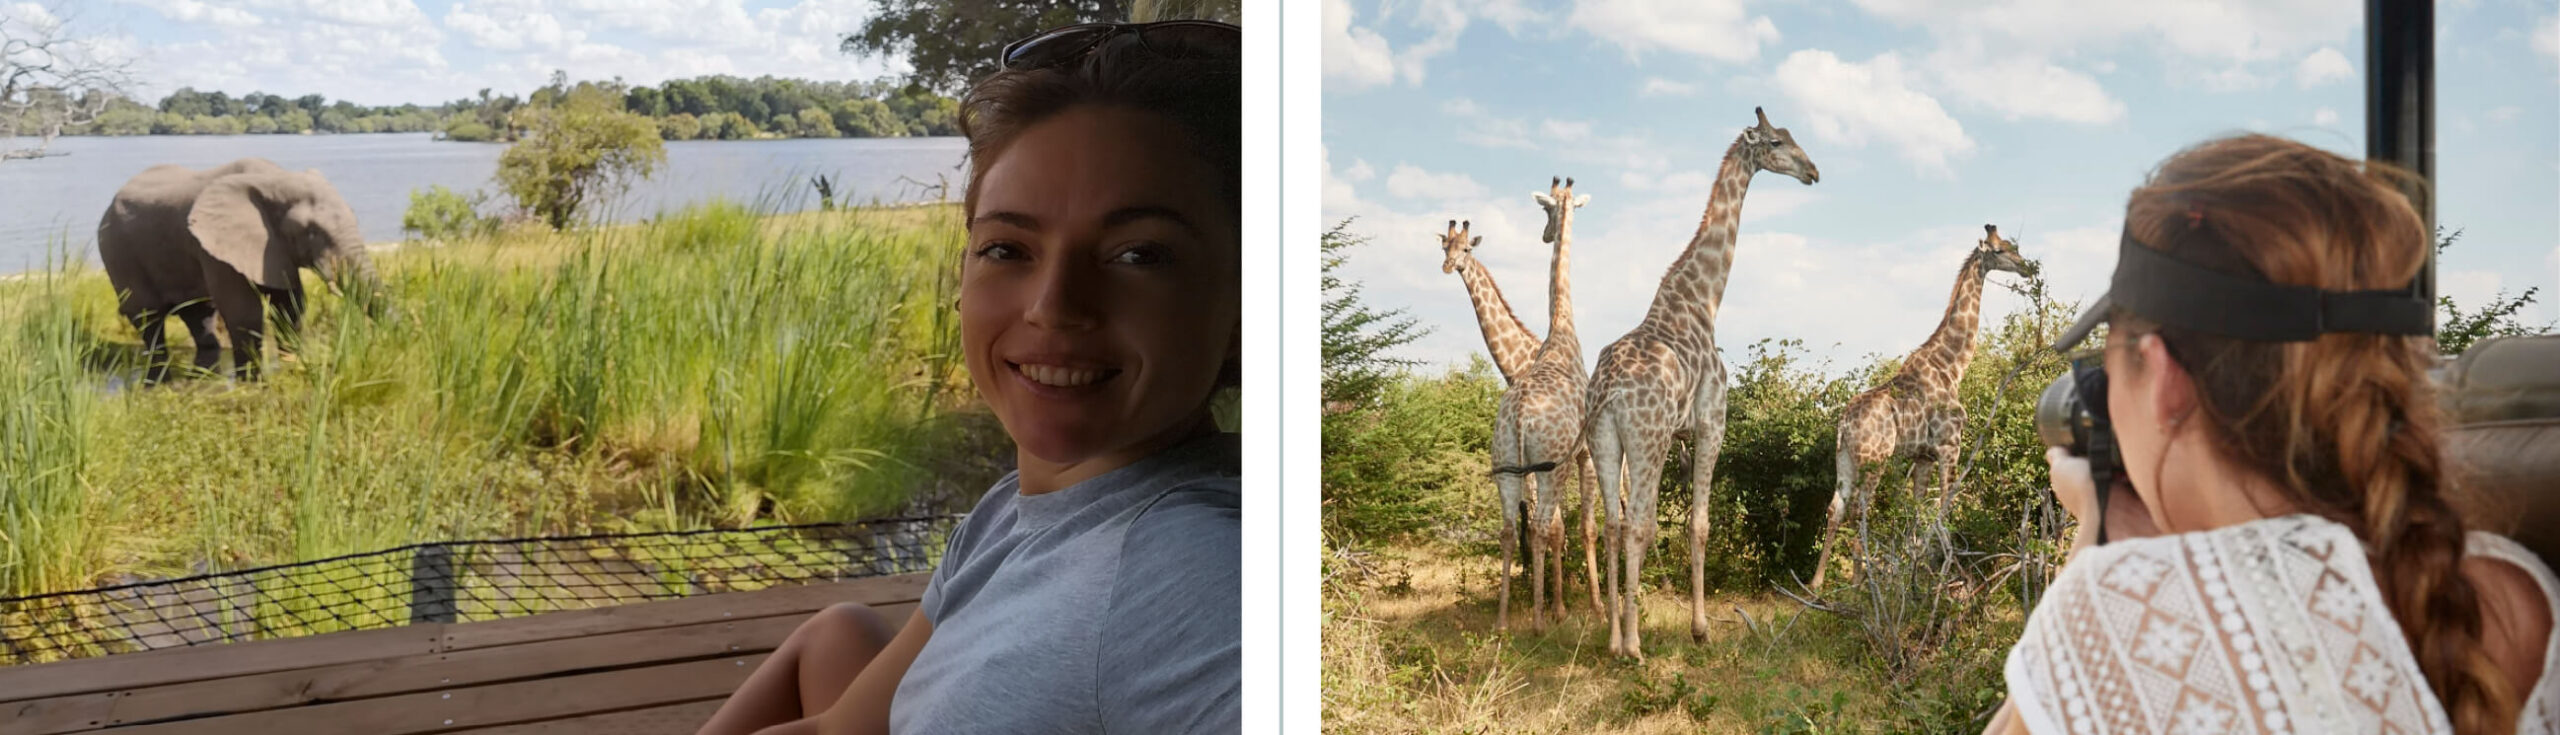 Images of Jena Gradwell looking at Giraffe & Elephant